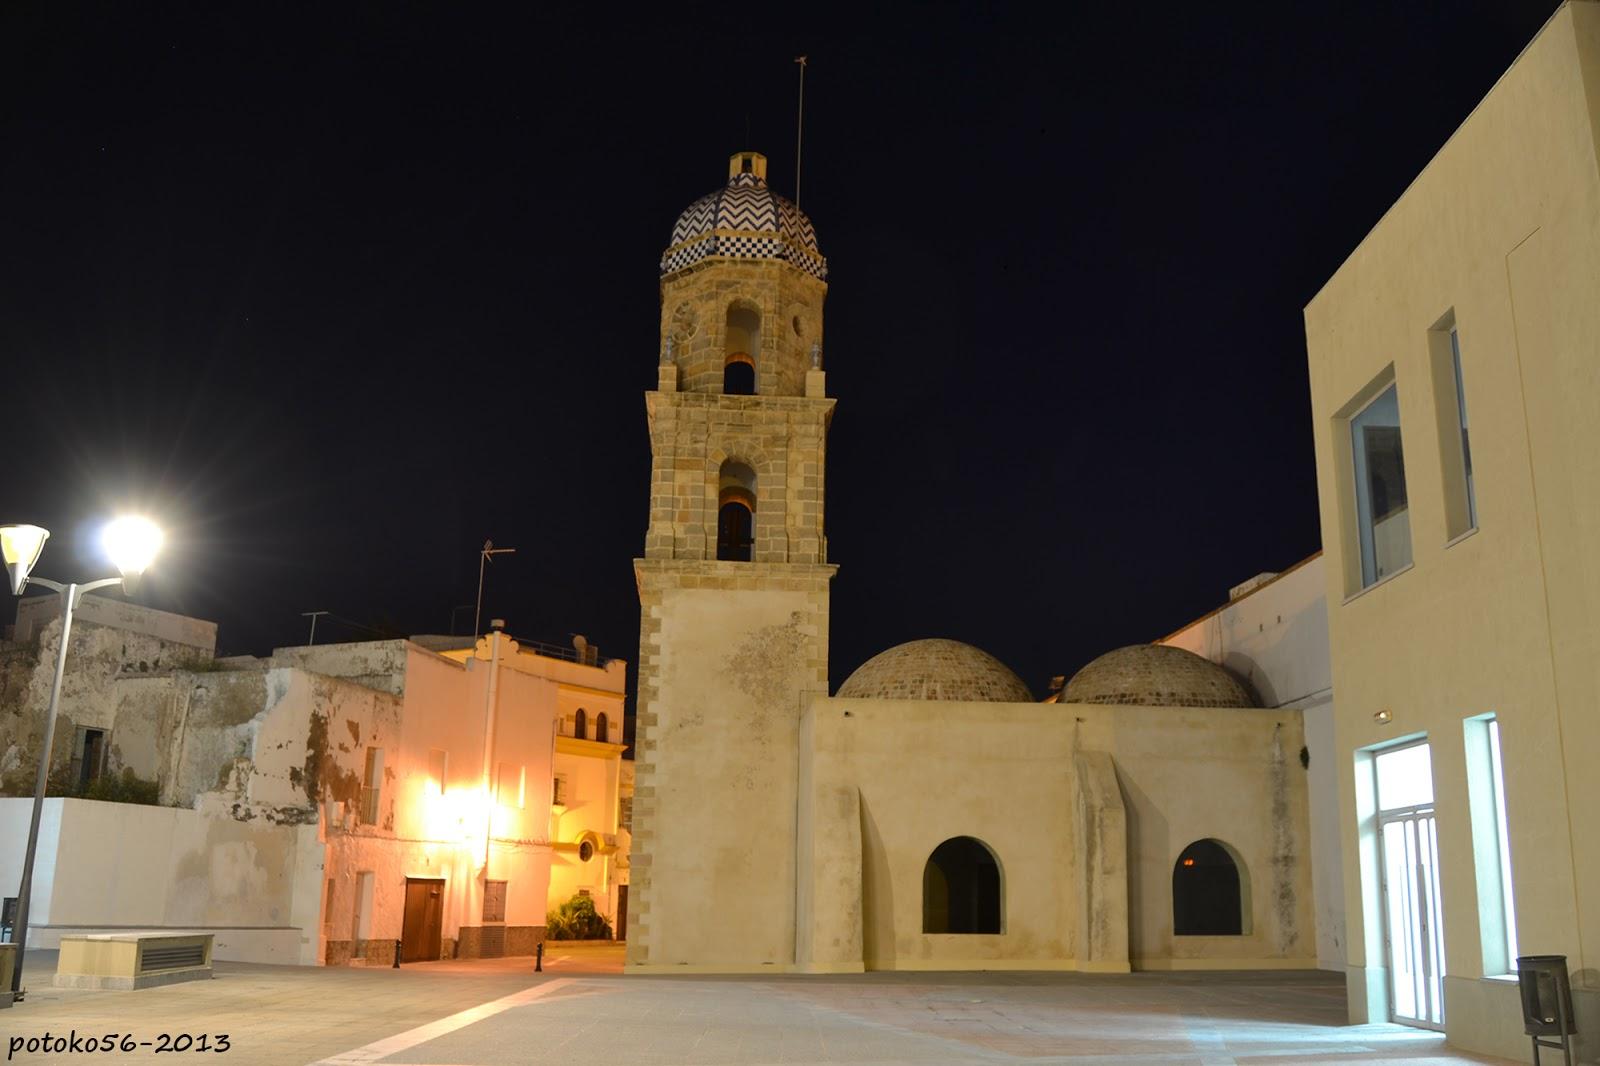 Torre y Plaza de la Merced Rota